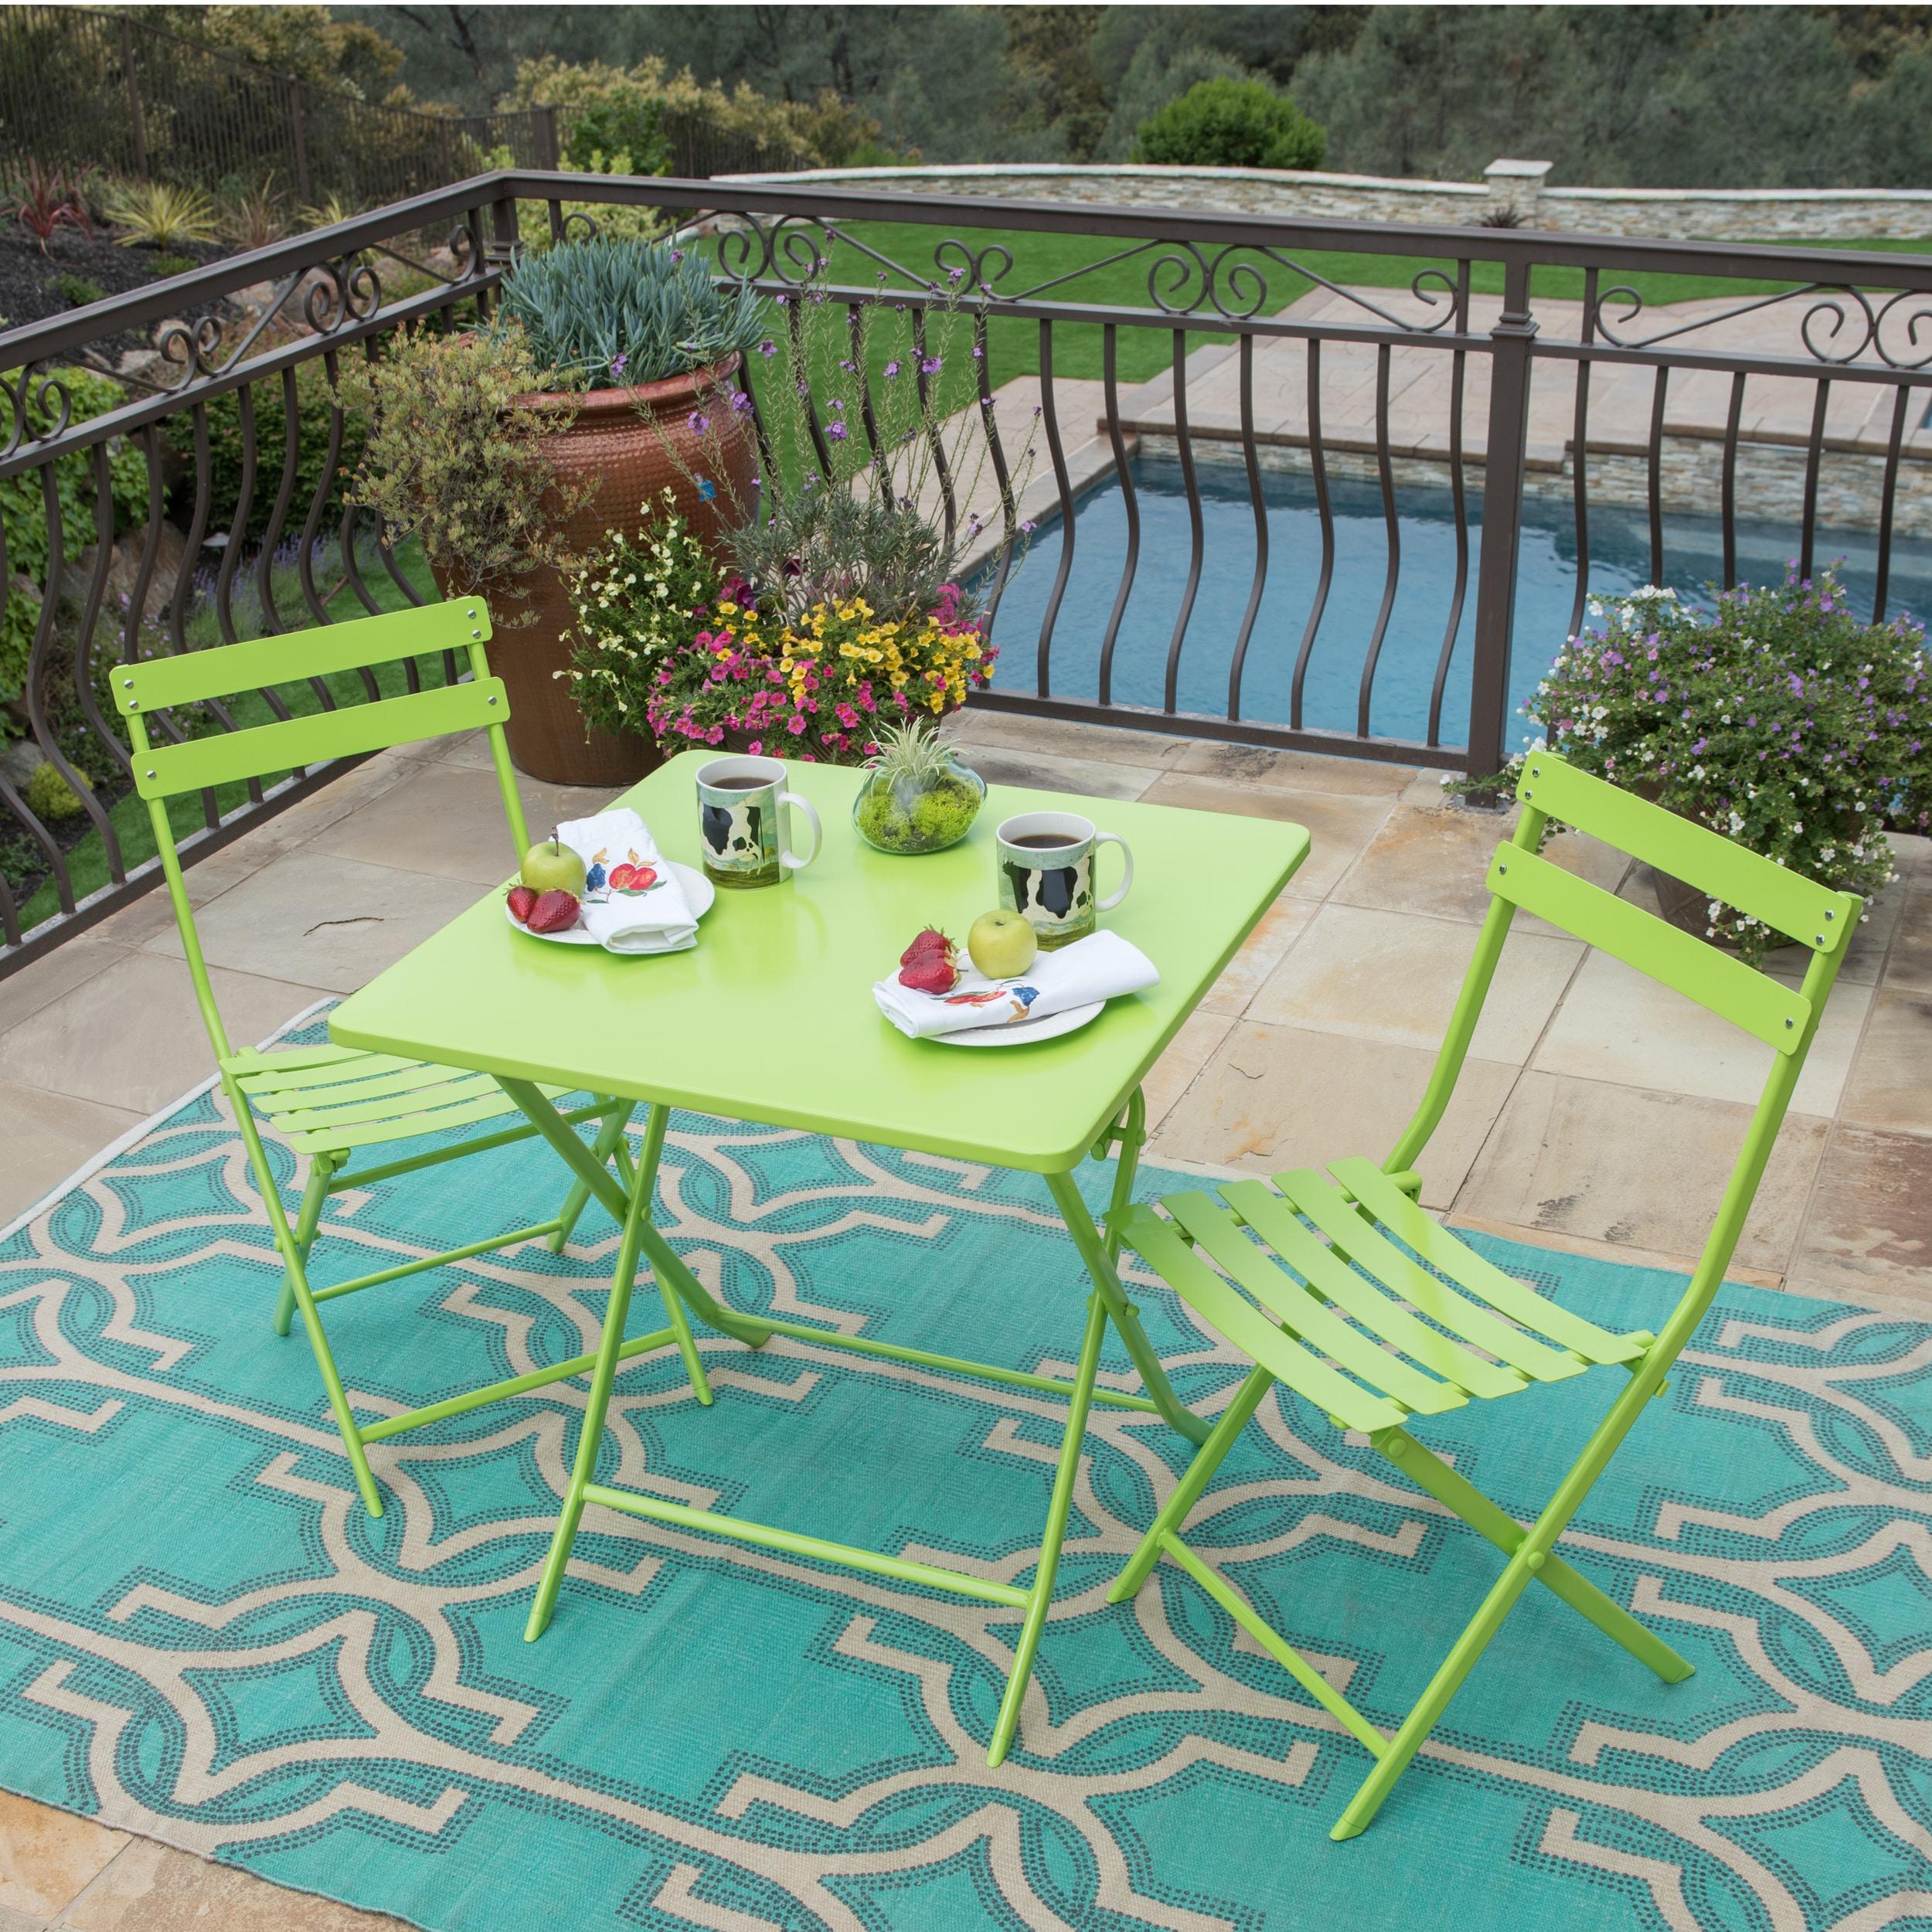 Corvus Rio Outdoor 3 Piece Square Green Folding Bistro Set